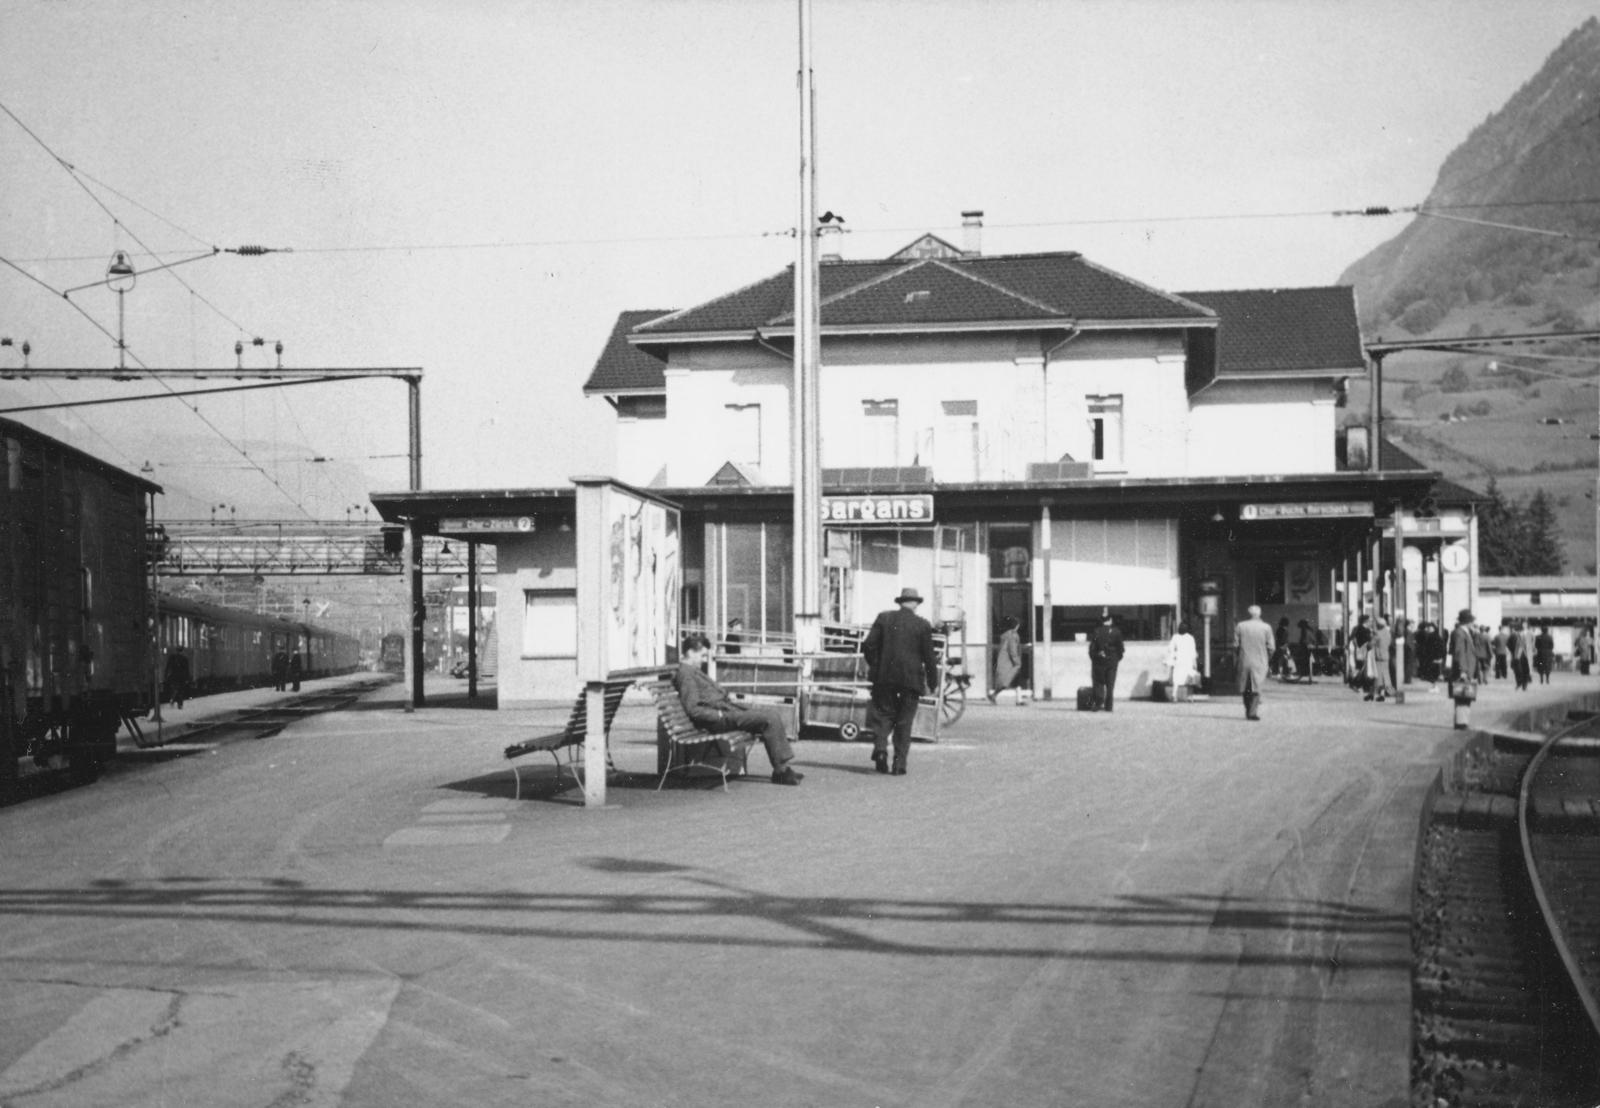 Sargans -  Gare/Bahnhof Sargans